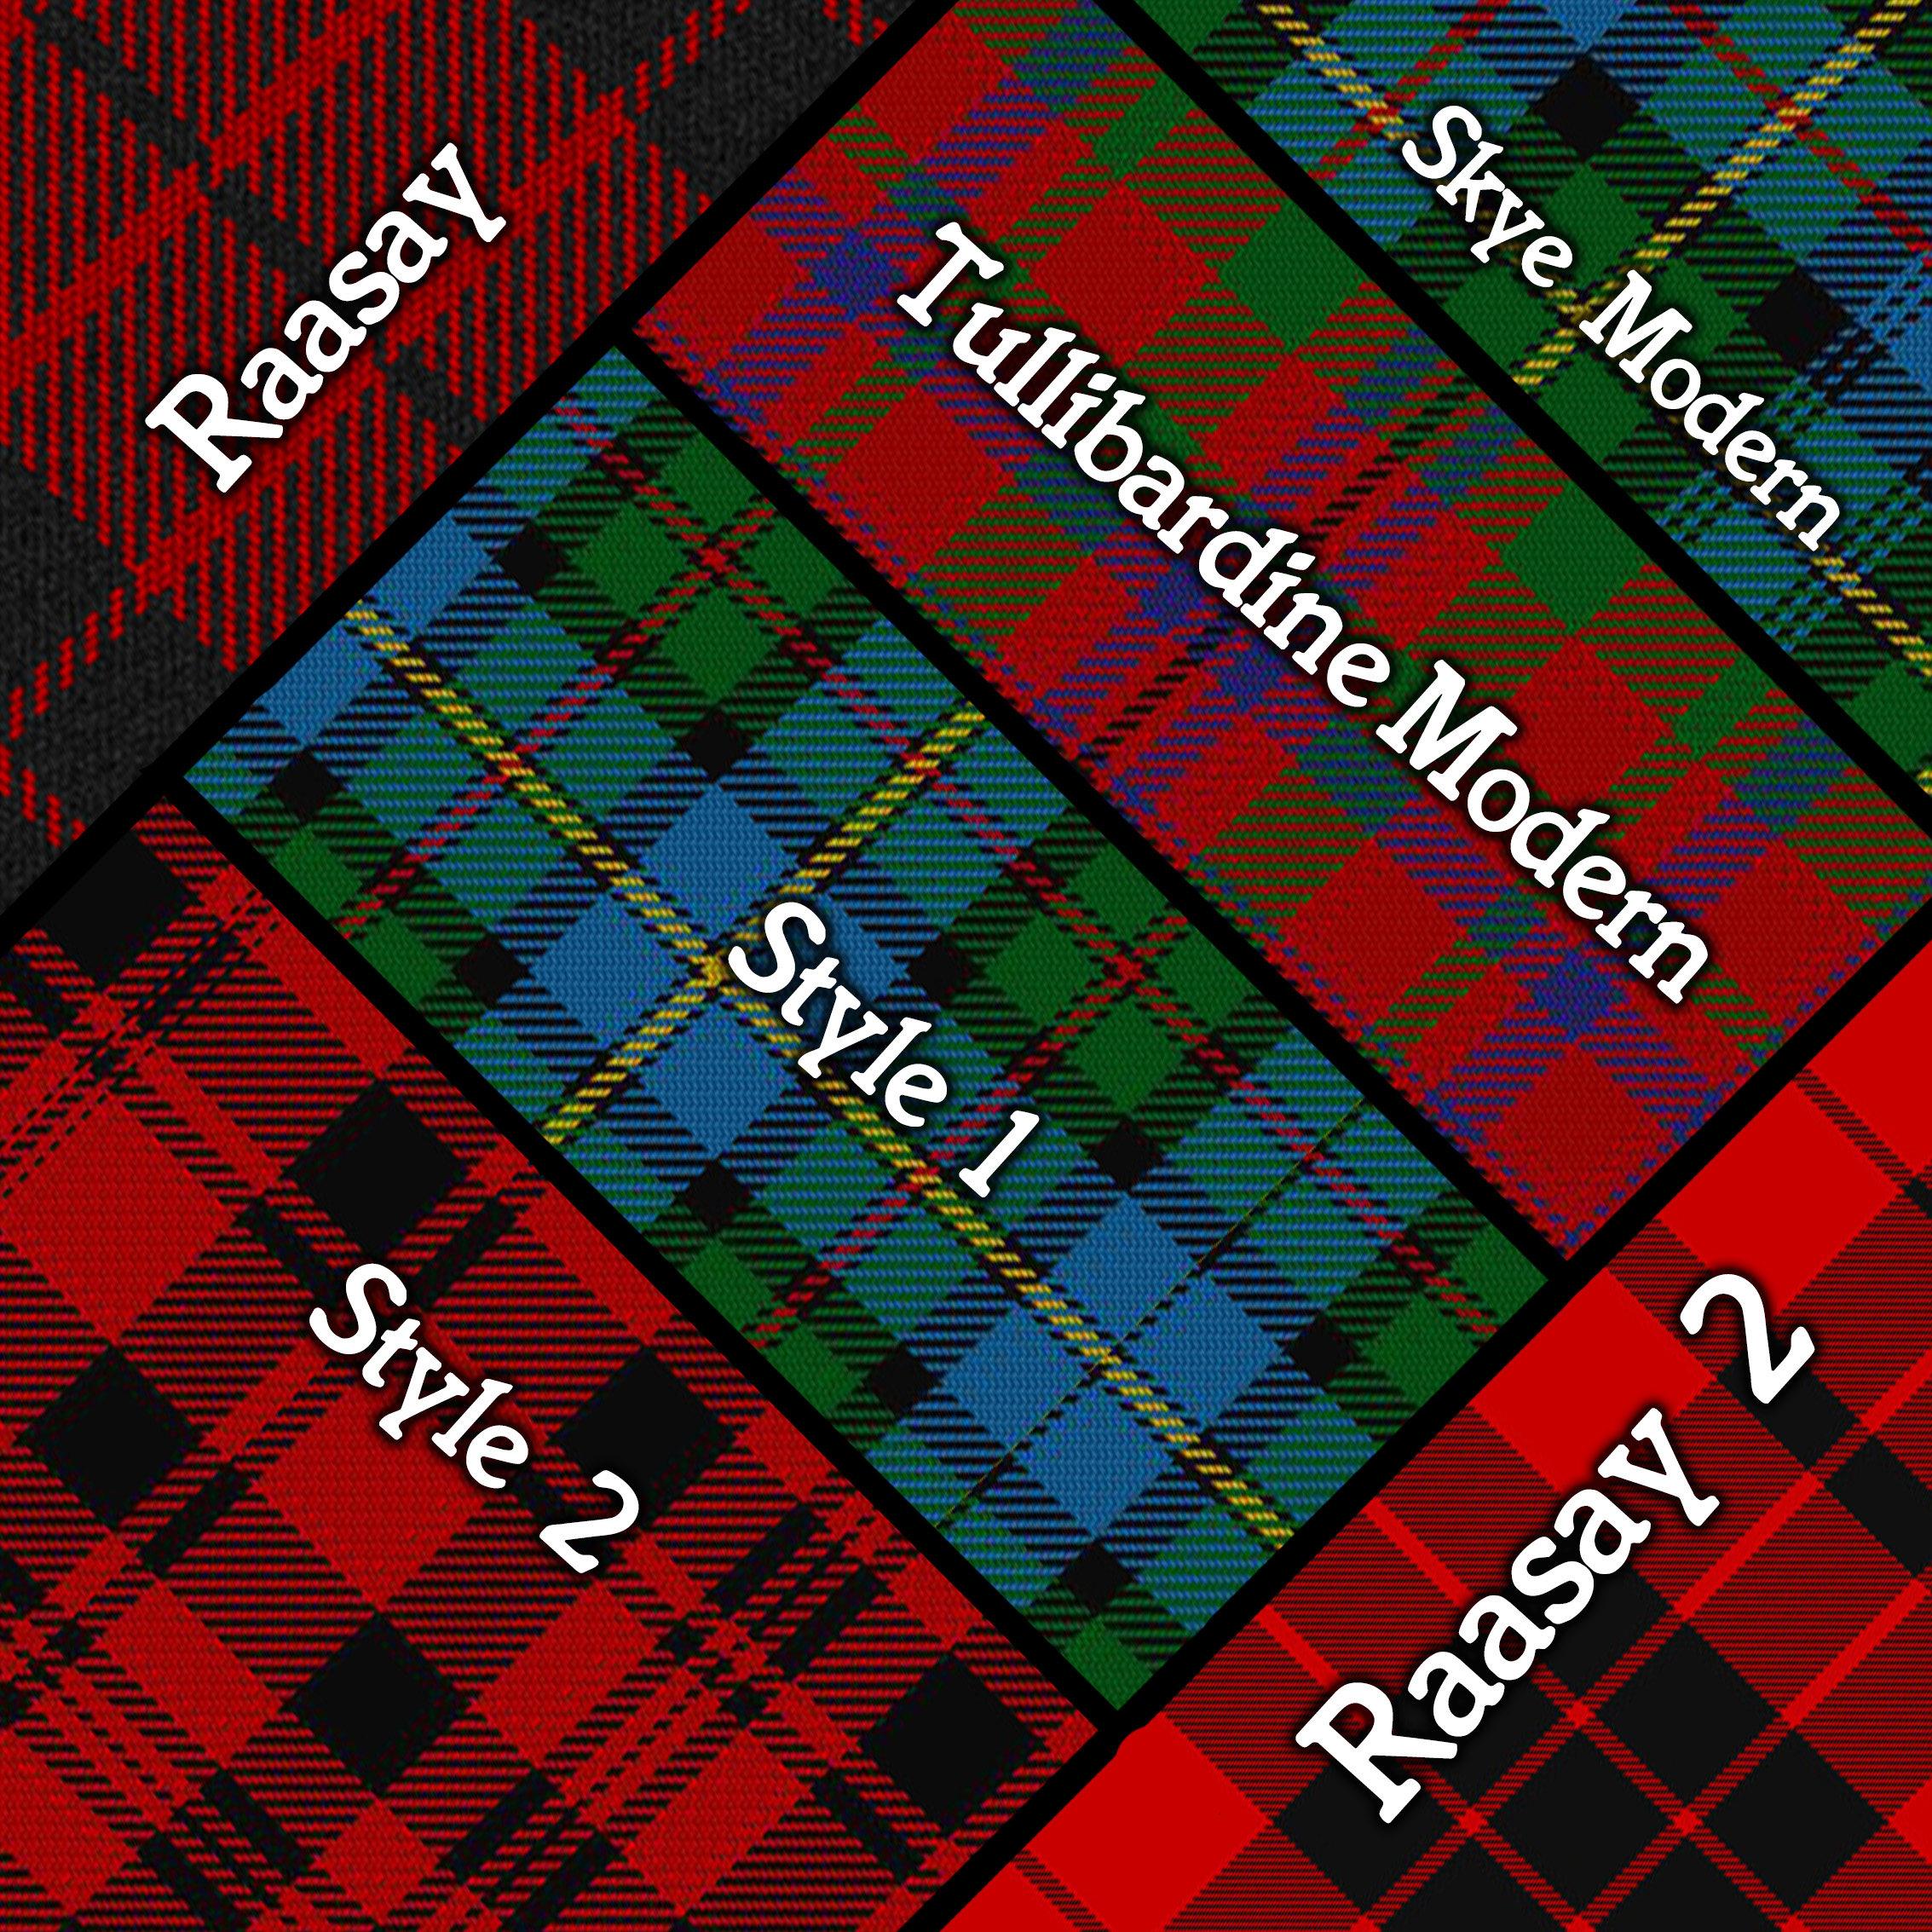 Macleod Sun Badge Shield Plaque With Scottish Clan Coat Of